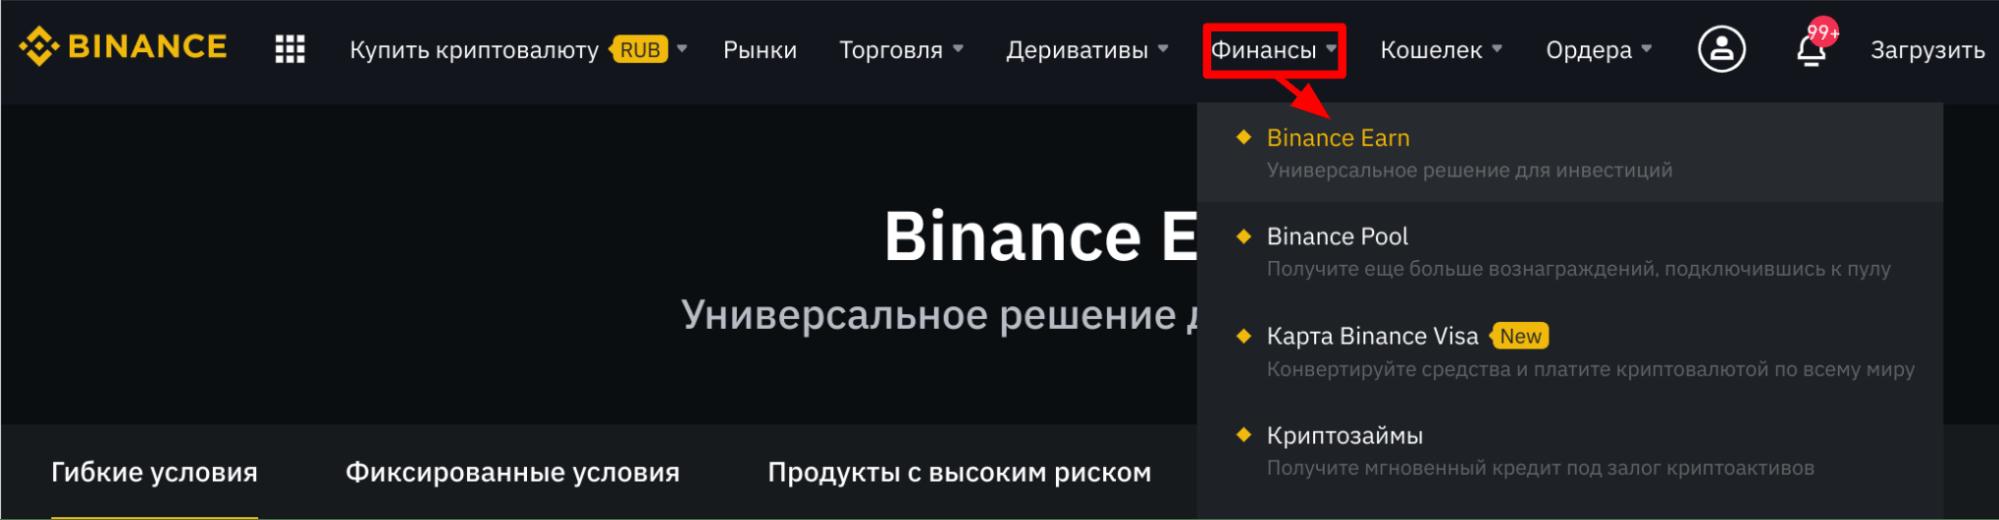 "Binance Earn в меню ""Финансы"""